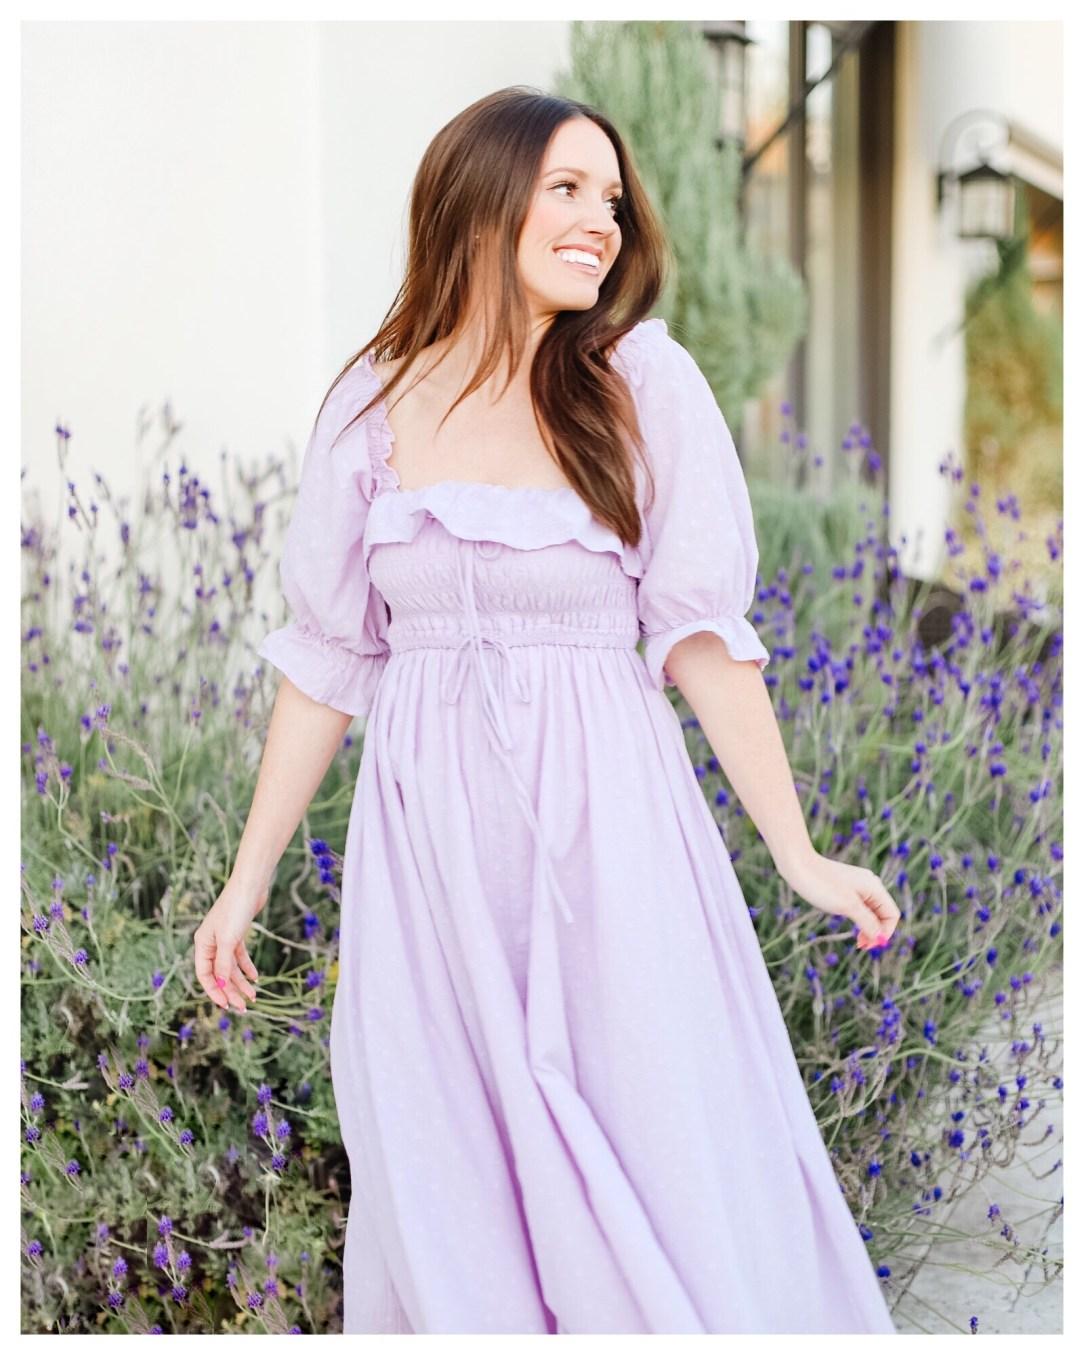 Lavender Spring Dress on Five Foot Feminine